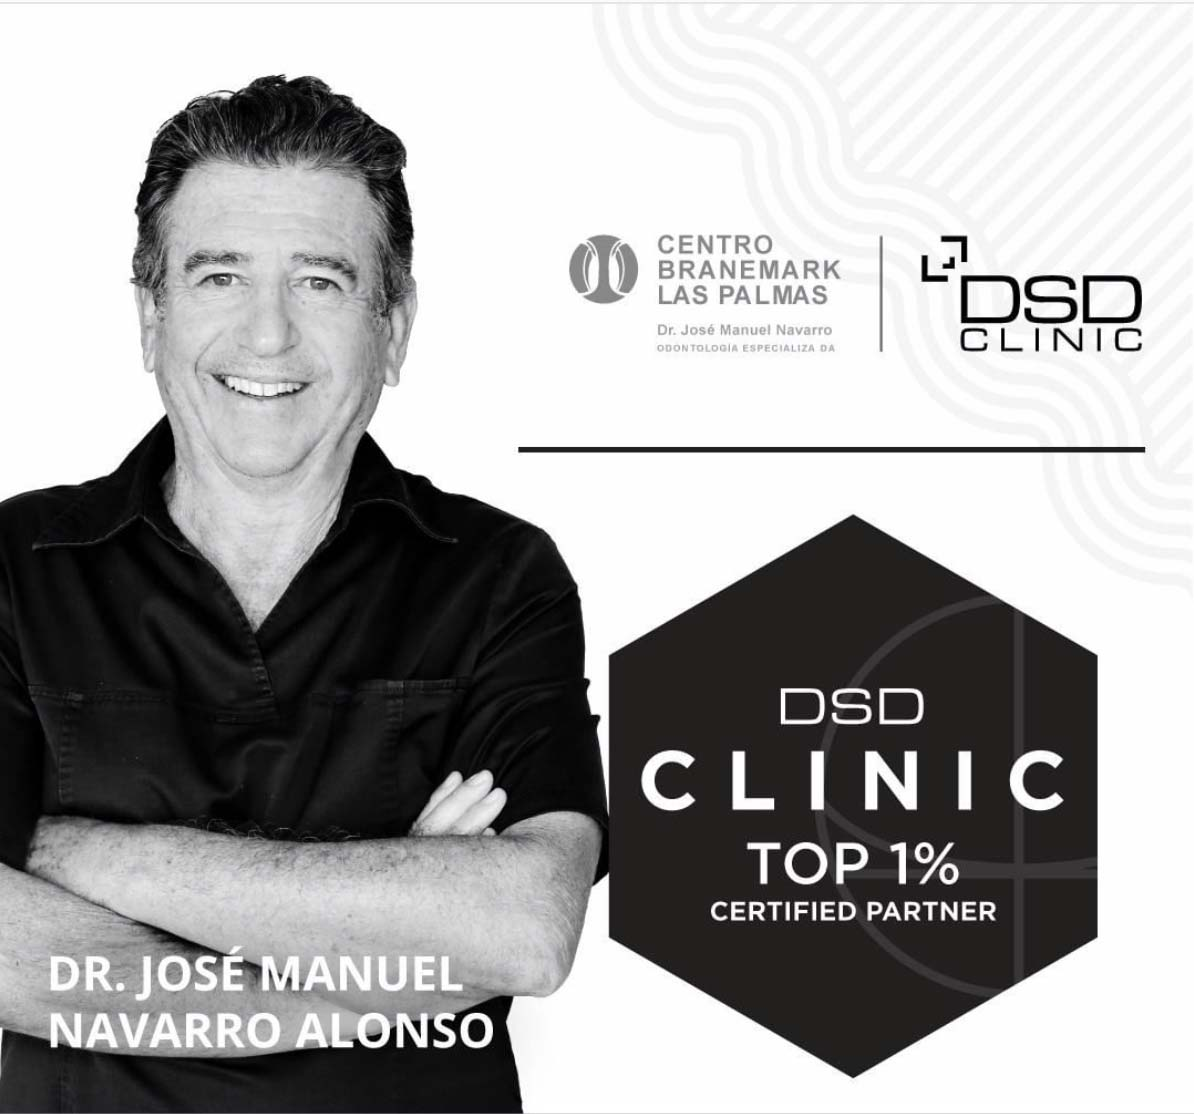 Dr. J.M. Navarro Alonso – DSD CERTIFIED PARTNER<